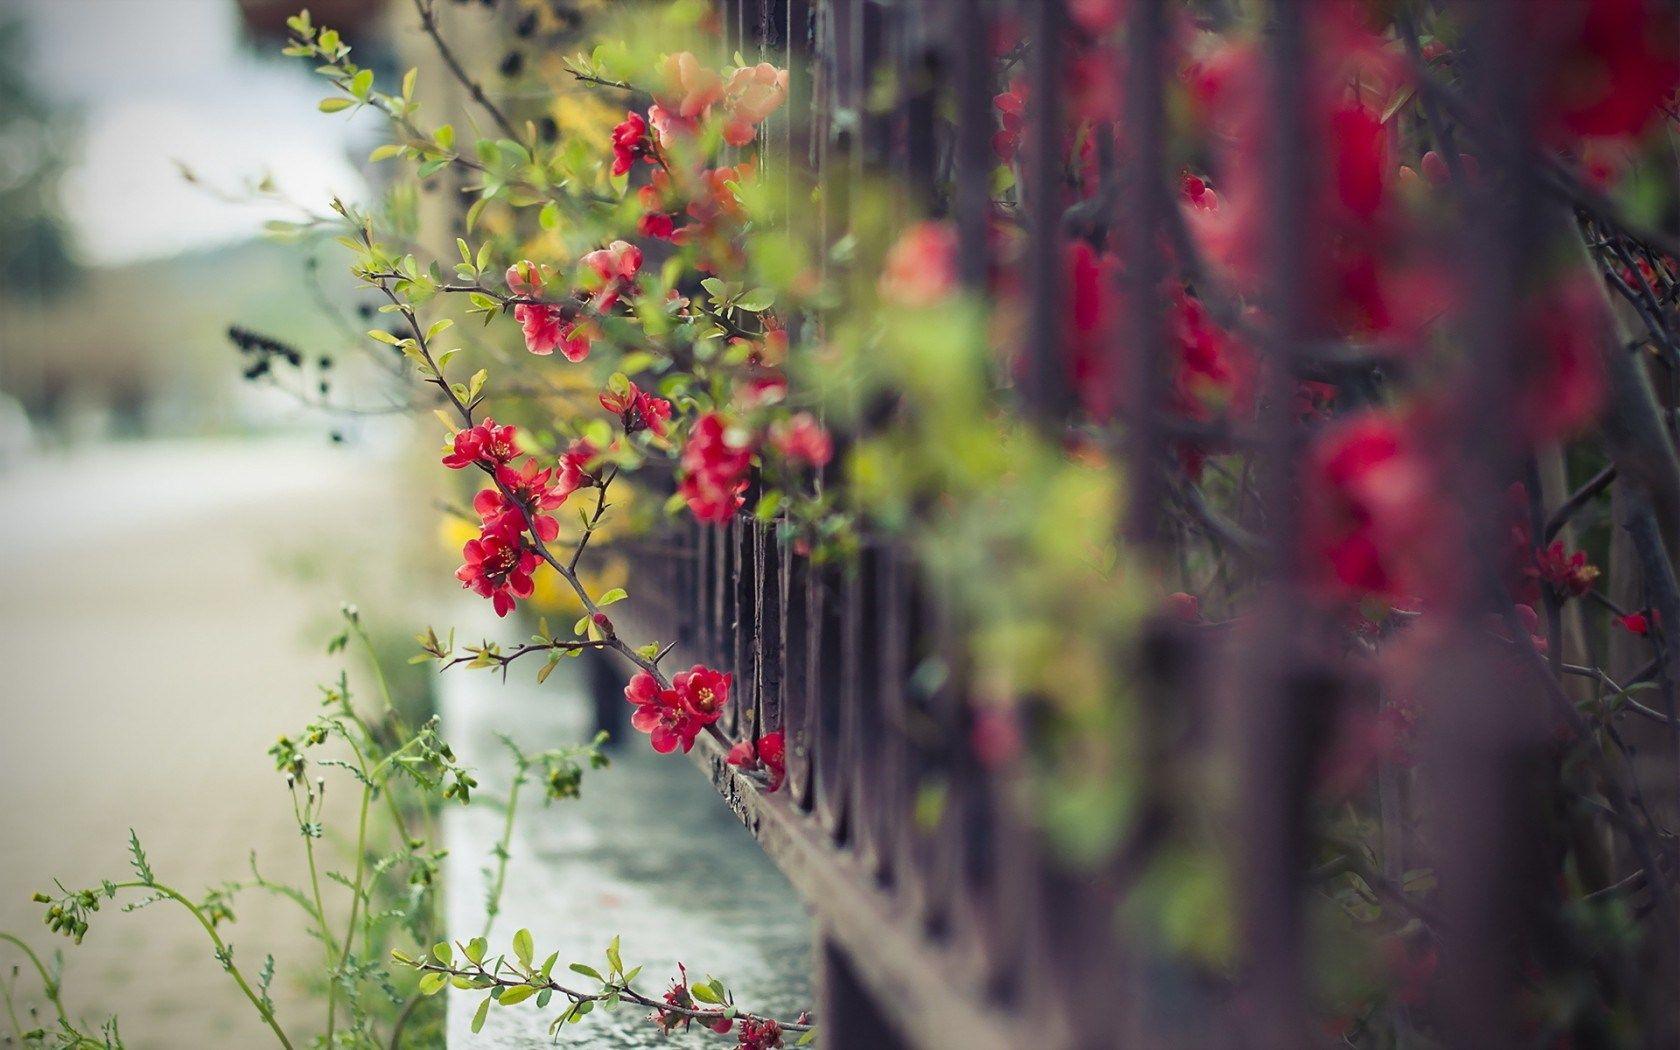 Pin by Beckey Douglas on pretty flowers  Pinterest  Pretty flowers